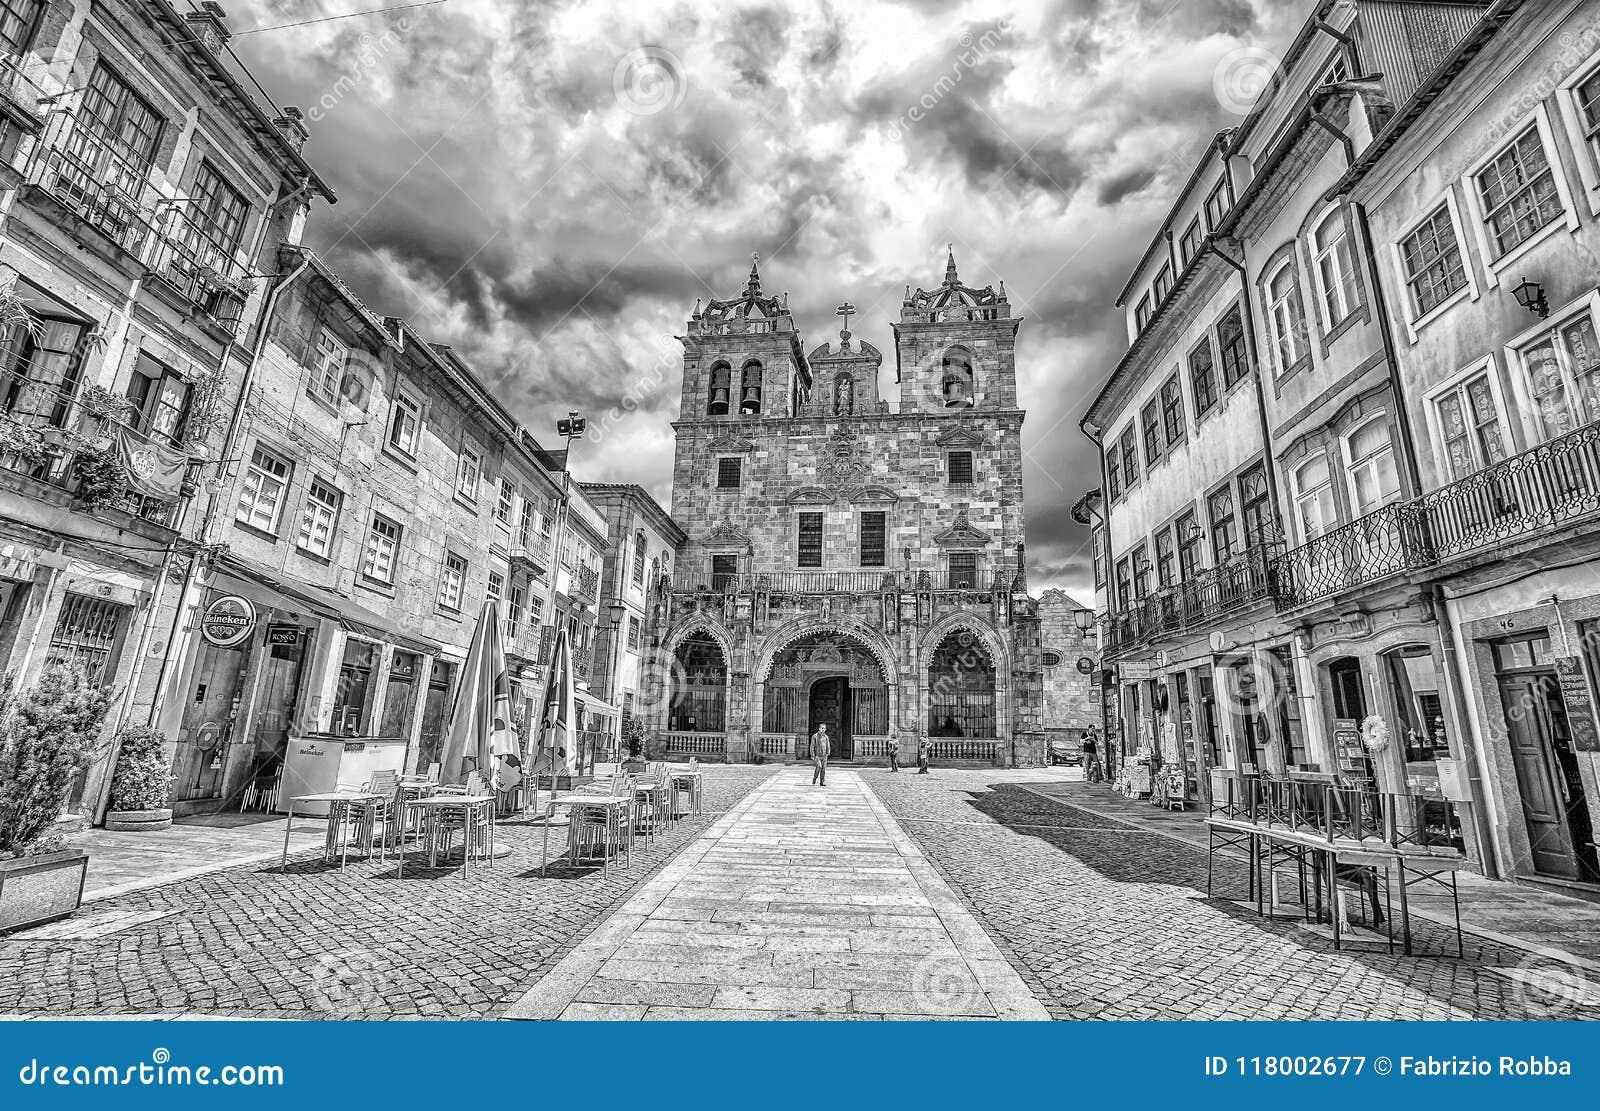 De Kathedraal van Braga in stads historisch centrum, Portugal